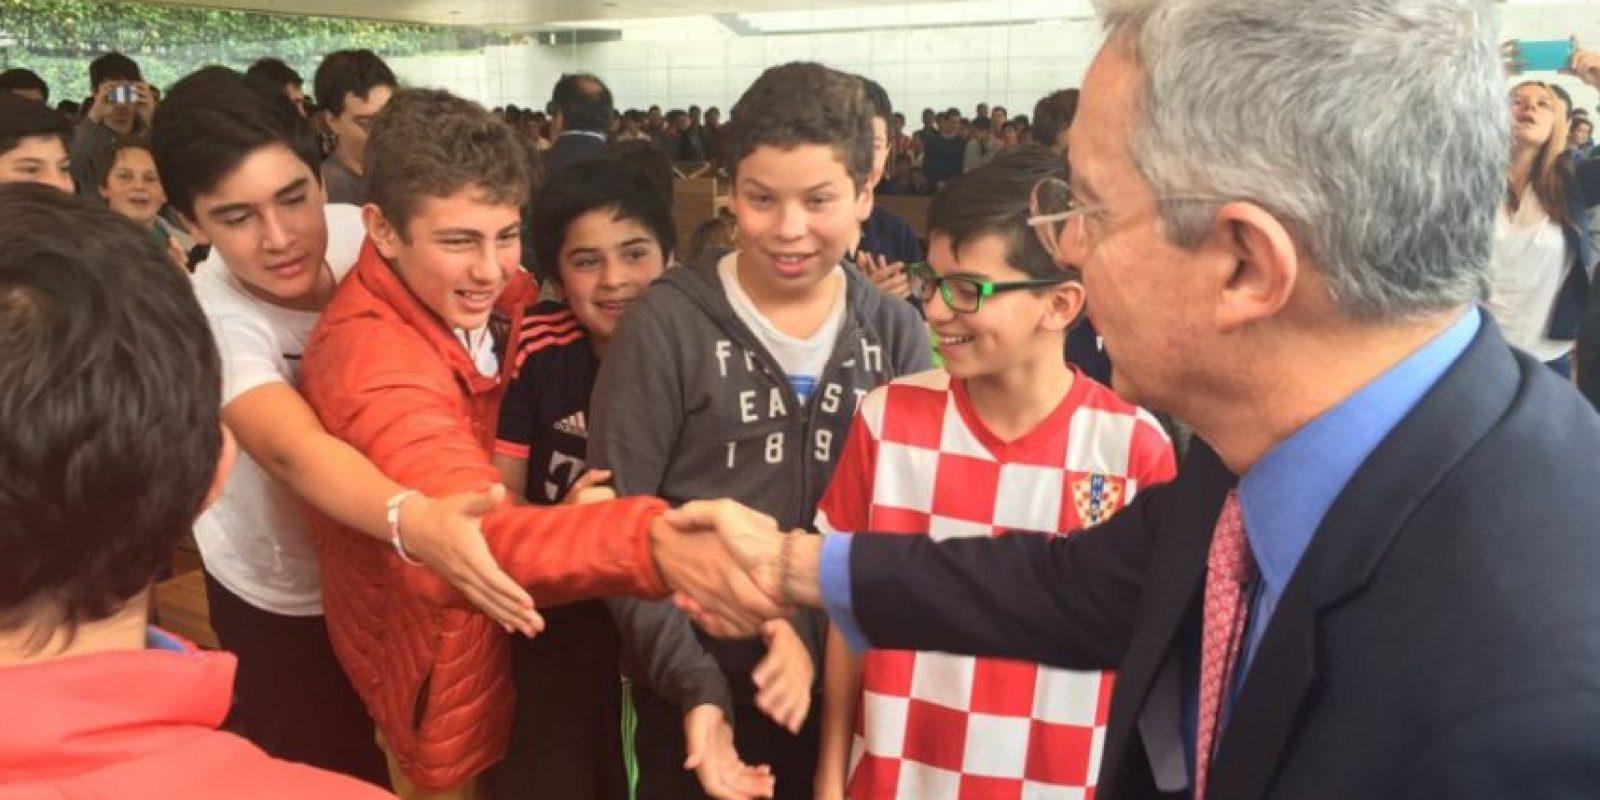 Visita de expresidente Álvaro Uribe al Gimnasio Campestre de Bogotá. Foto:Tomada de Twitter @AlvaroUribeVel